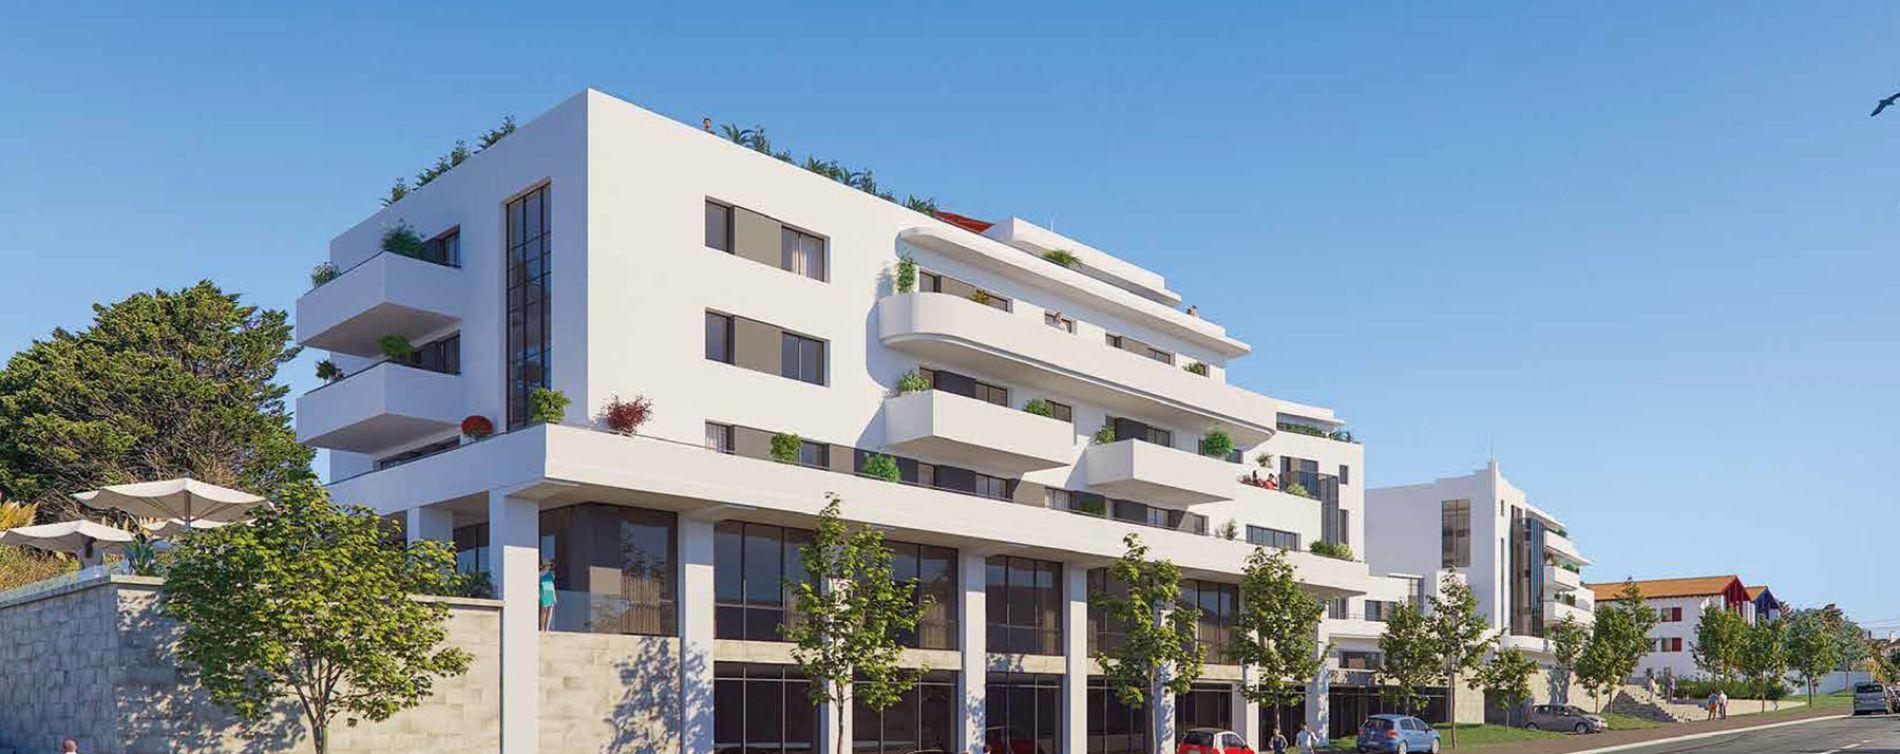 Biarritz : programme immobilier neuve « Programme immobilier n°217099 » (2)